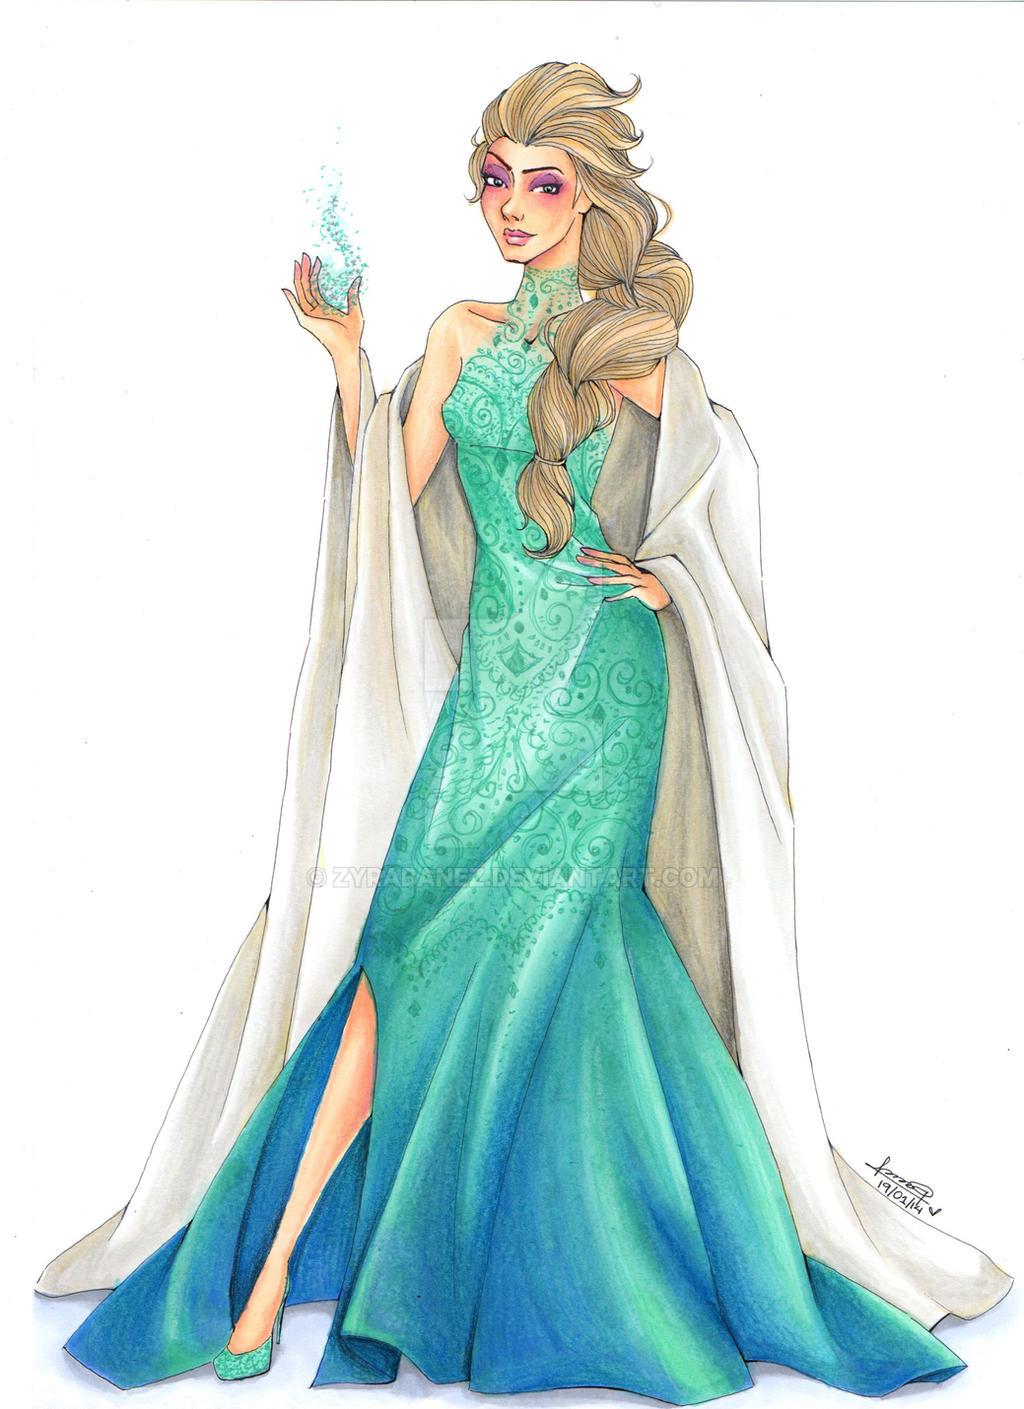 Fashion illustration elsa by zyrabanez on deviantart